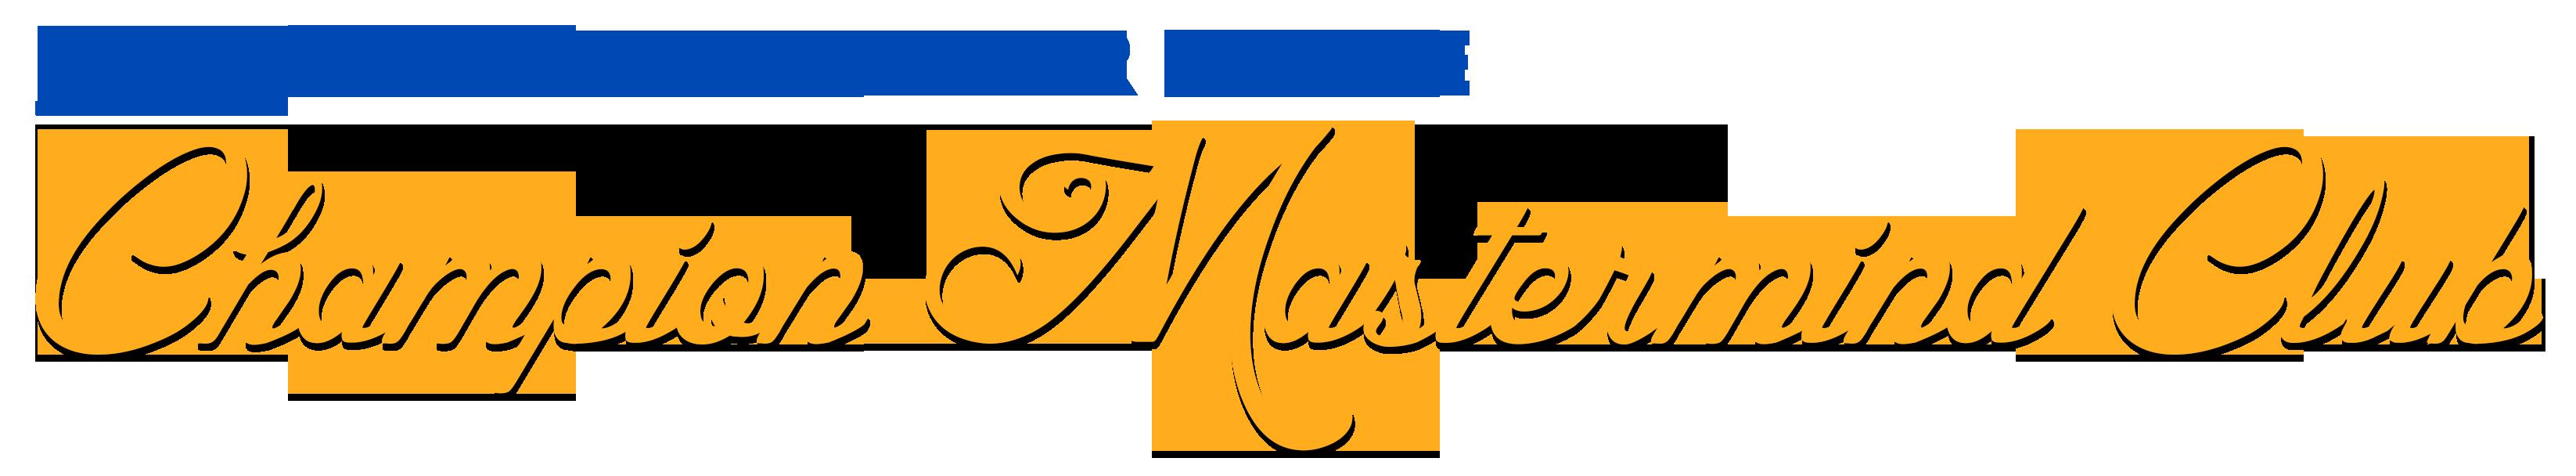 Inner Circle Champion Mastermind Club Logo